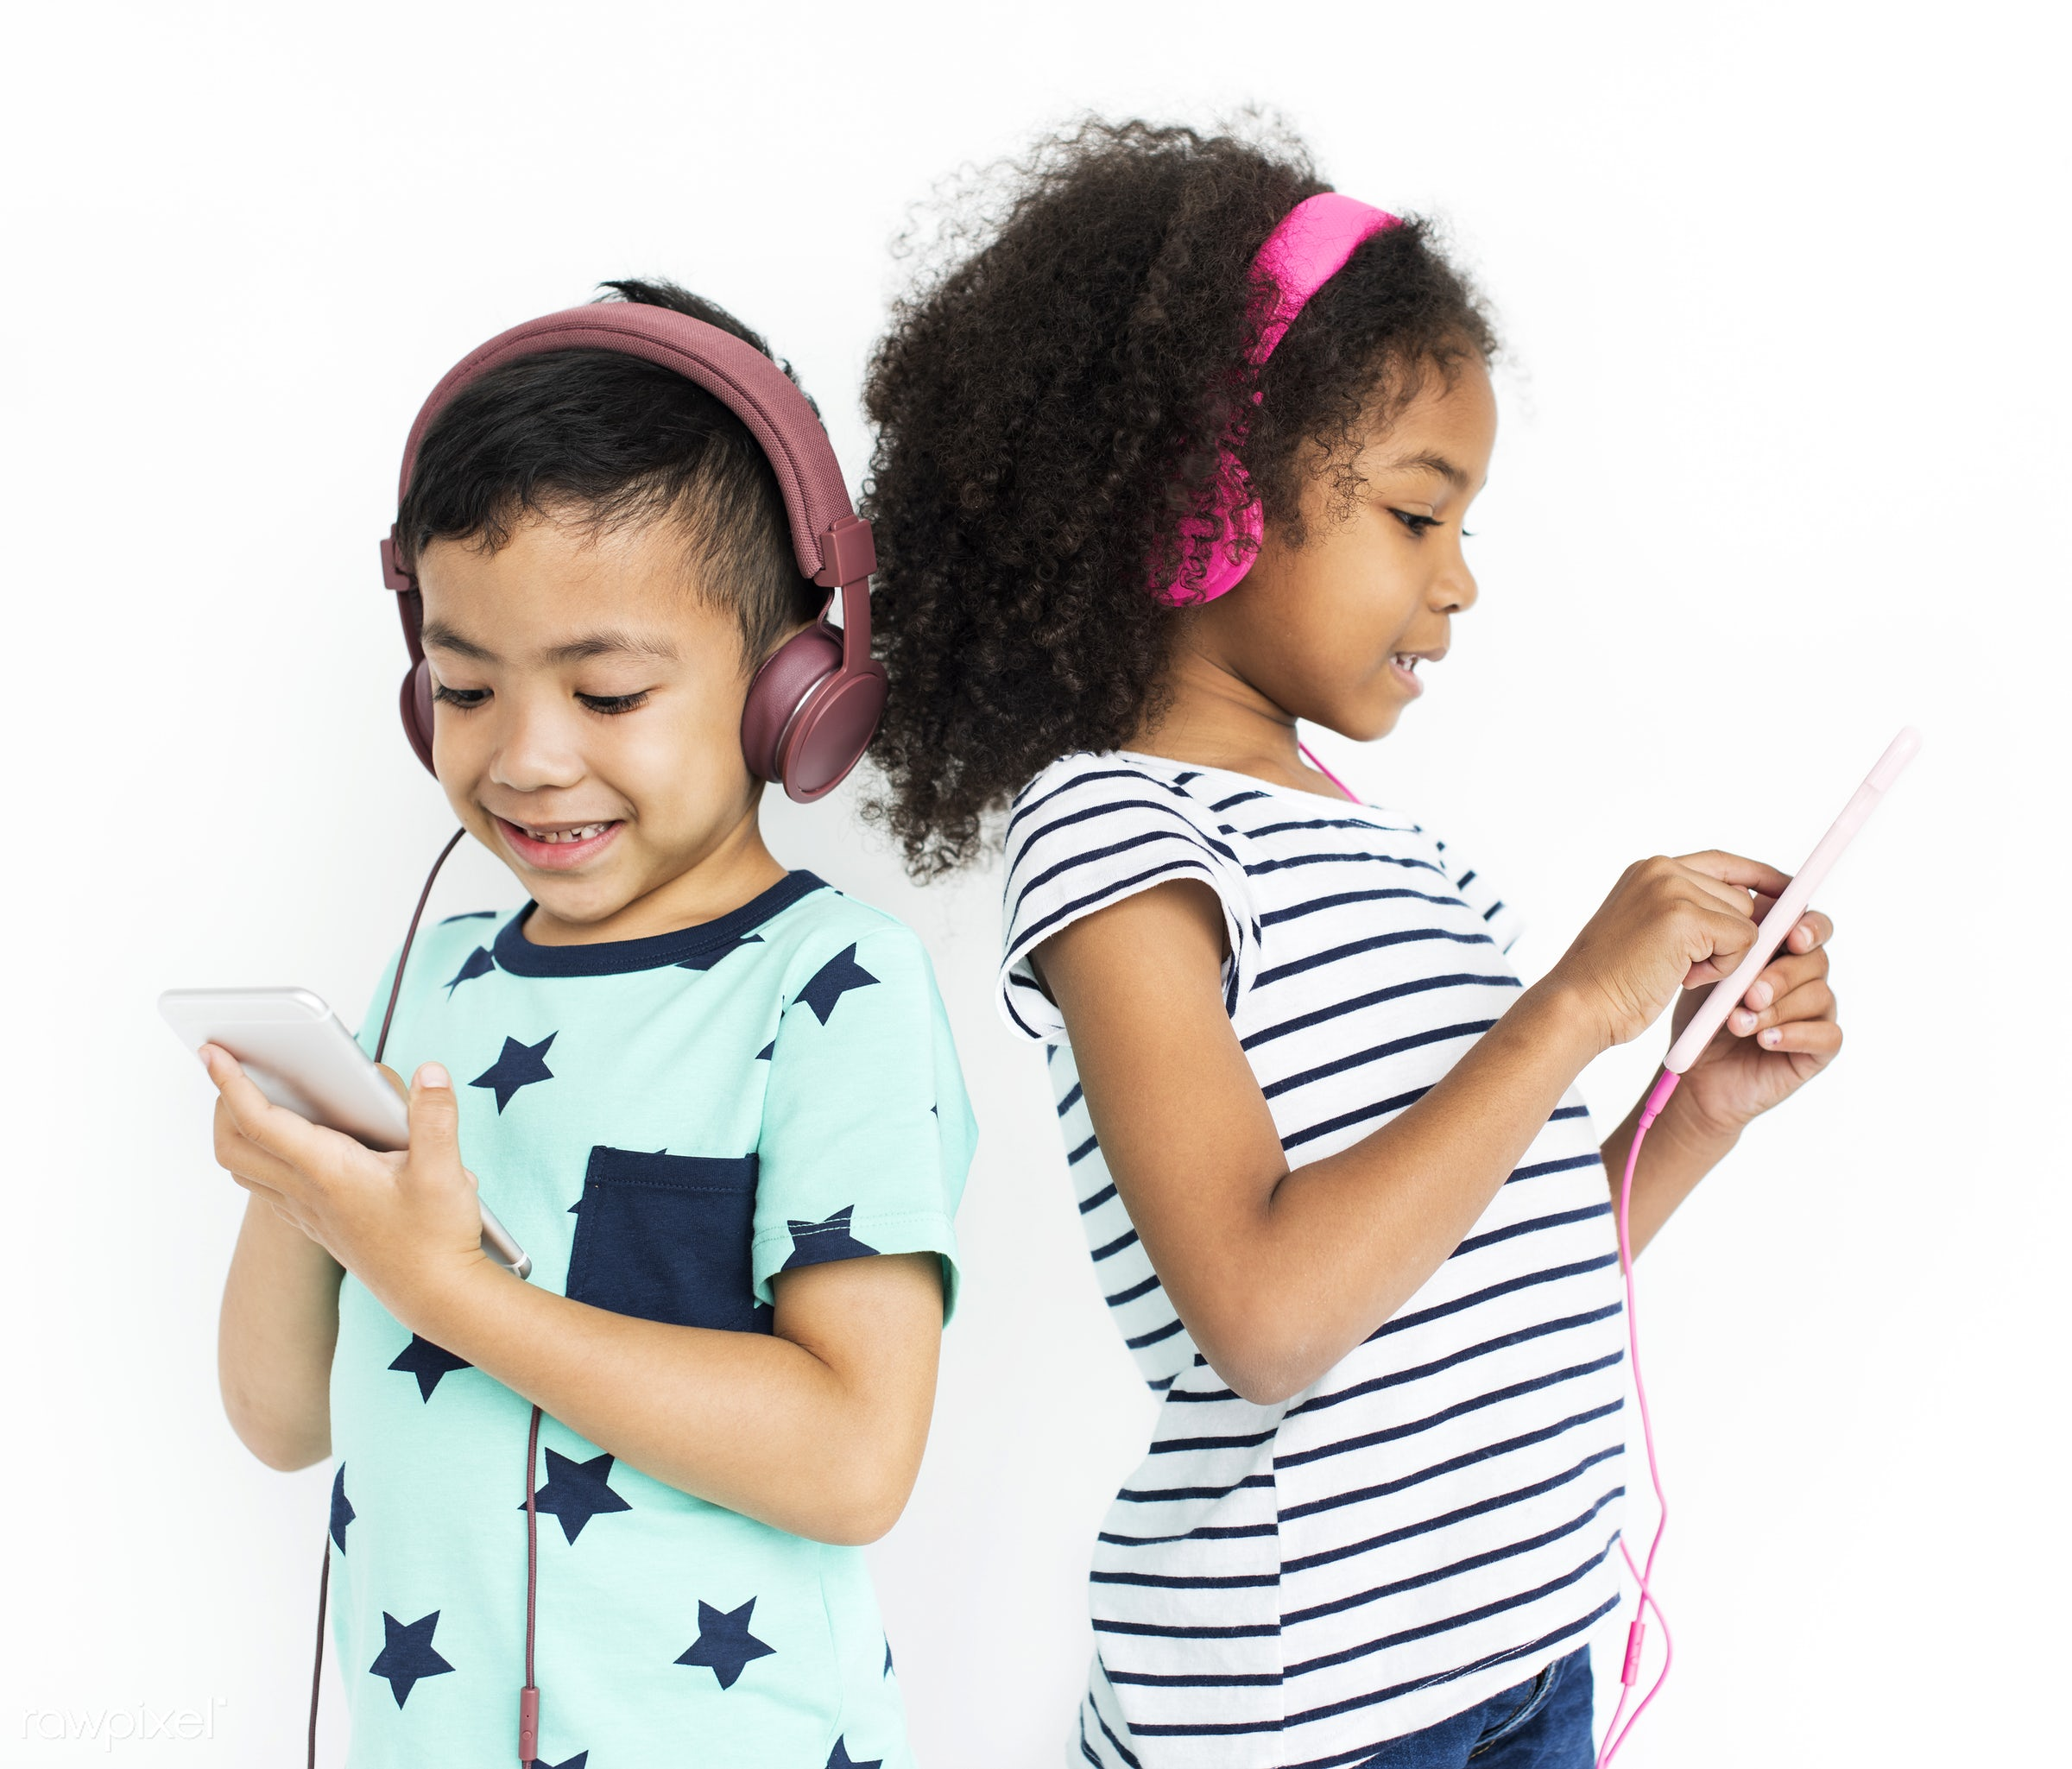 headphones, music, entertainment, listen, hobby, cheerful, child, children, diversity, friends, friendship, group, isolated...